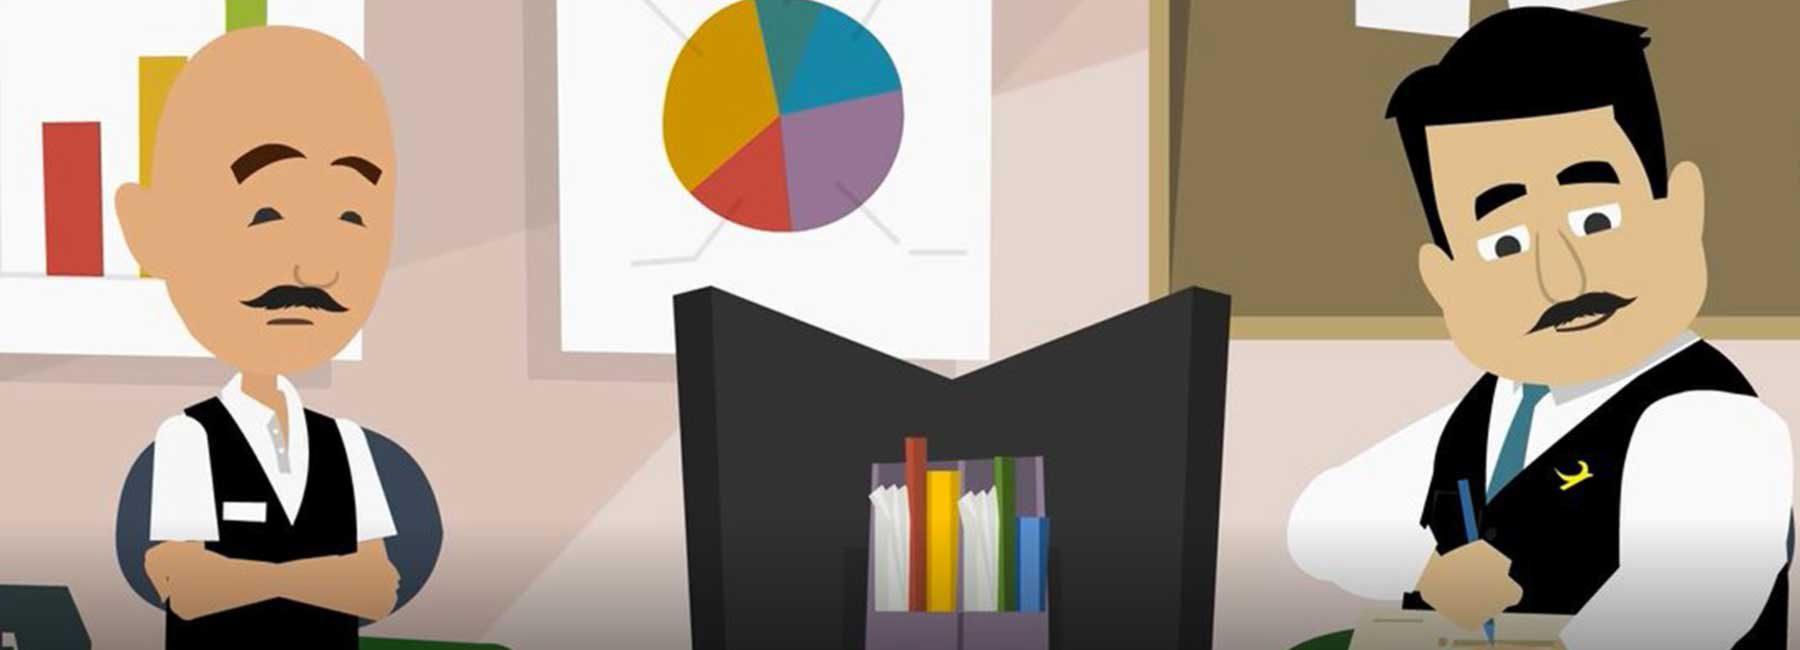 "Animations-Miniserie ""Josip & Malec"""